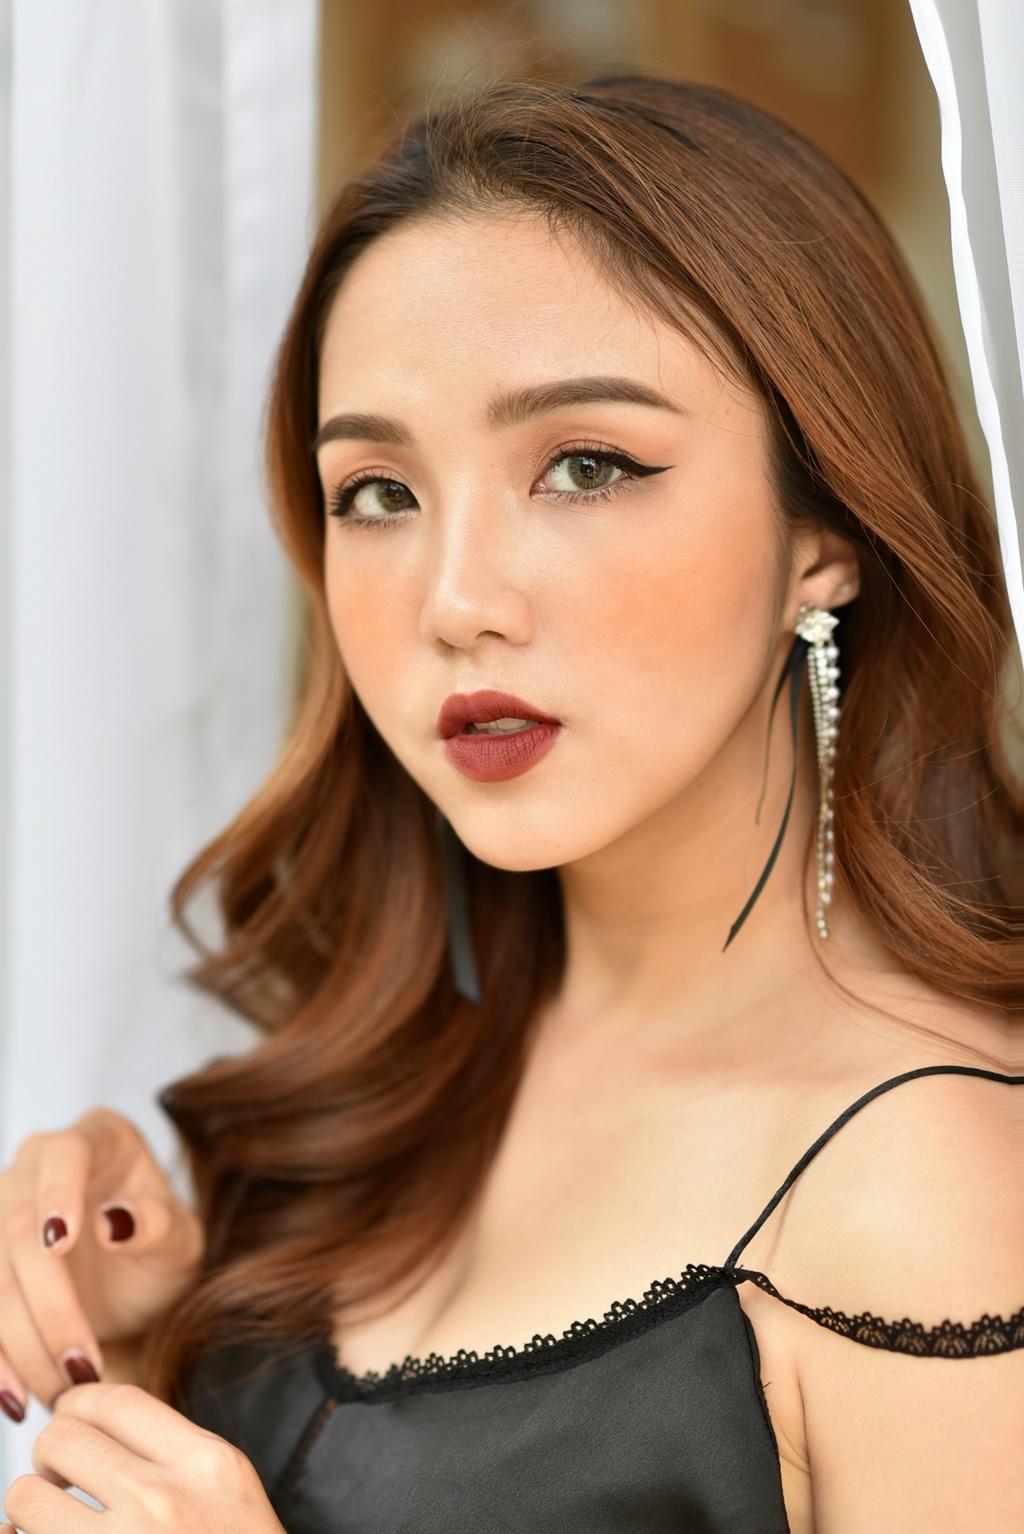 Cuu hot girl THPT Viet Duc dong MV 'Tinh don phuong' cover la ai? hinh anh 7